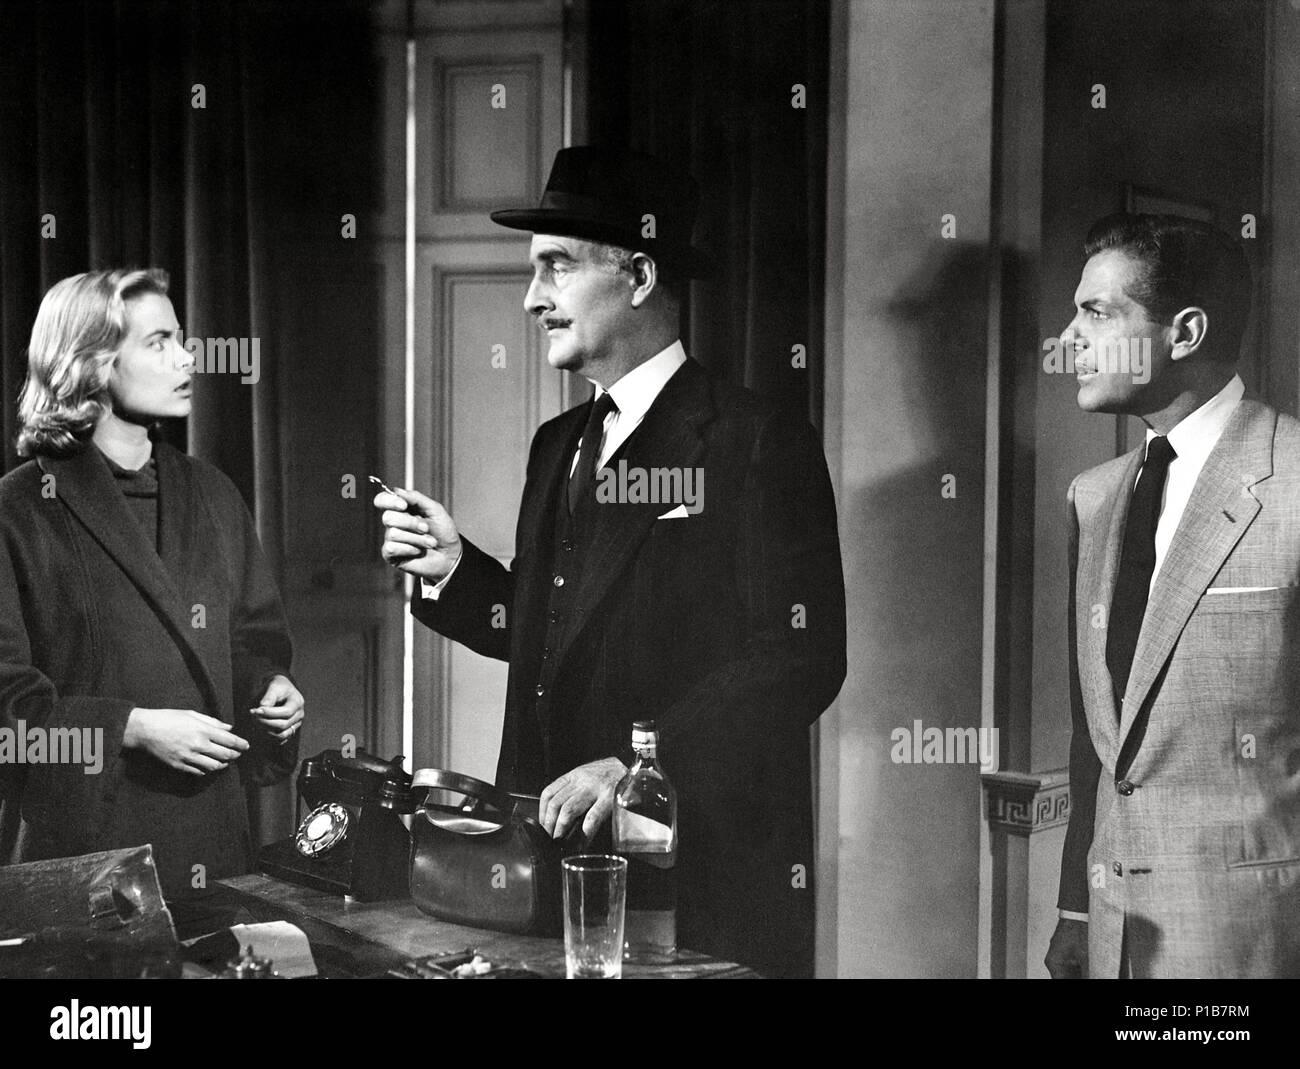 b8140e5ba483 Original Film Title  DIAL M FOR MURDER. English Title  DIAL M FOR MURDER.  Film Director  ALFRED HITCHCOCK. Year  1954. Stars  GRACE KELLY  JOHN  WILLIAMS  ...